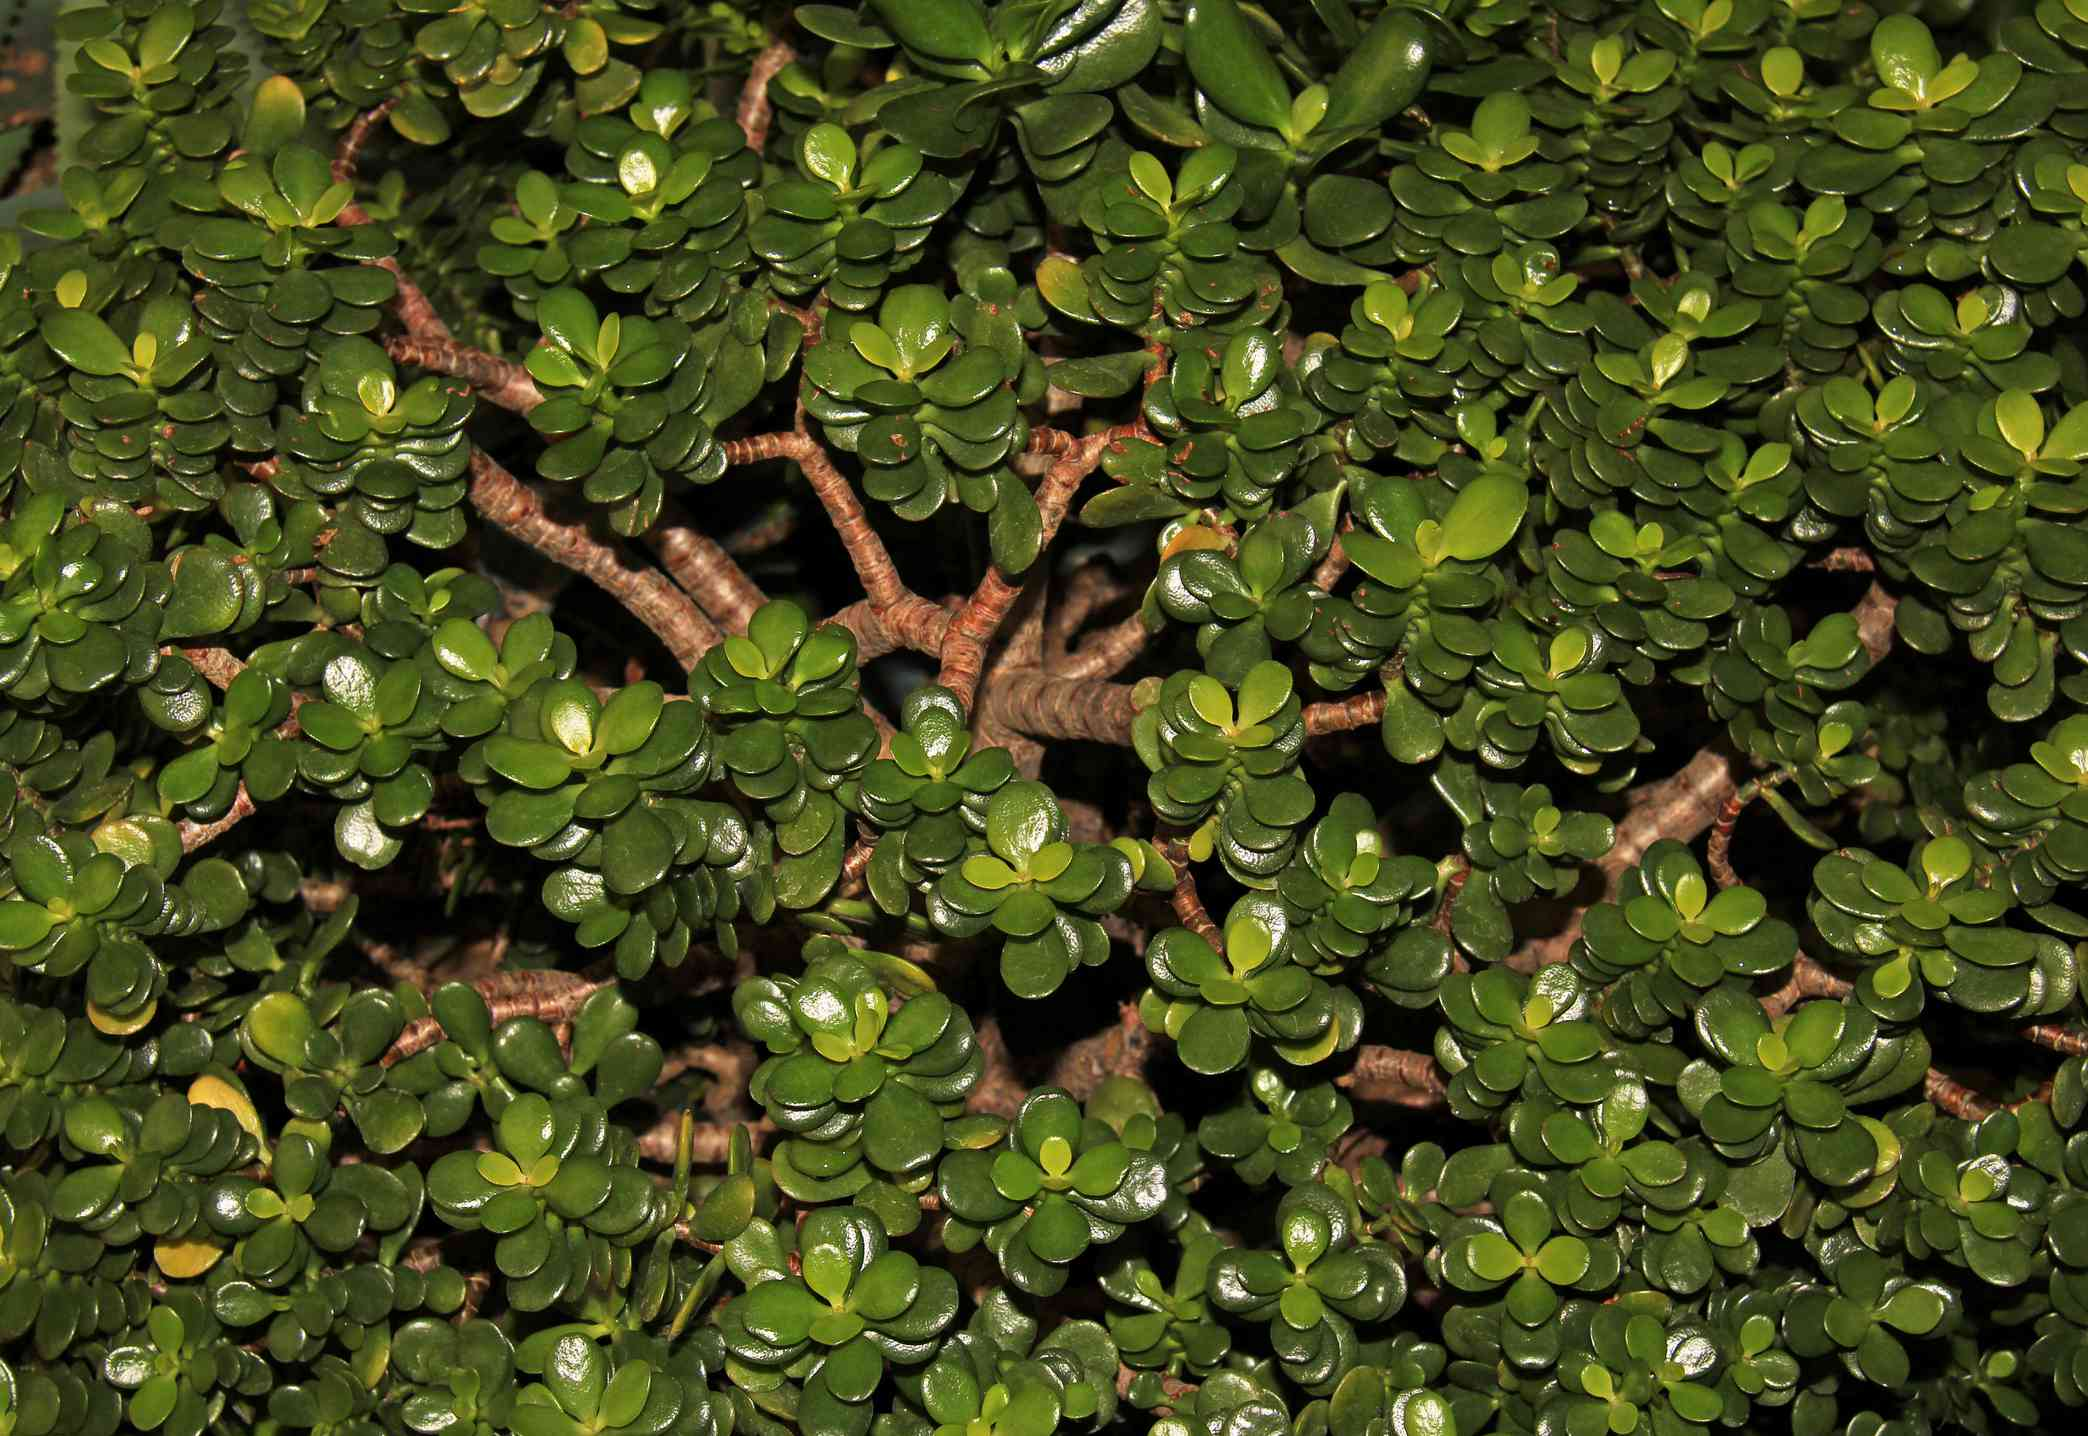 Crassula ovata - Jade plant - Friendship tree - Lucky plant - Money tree